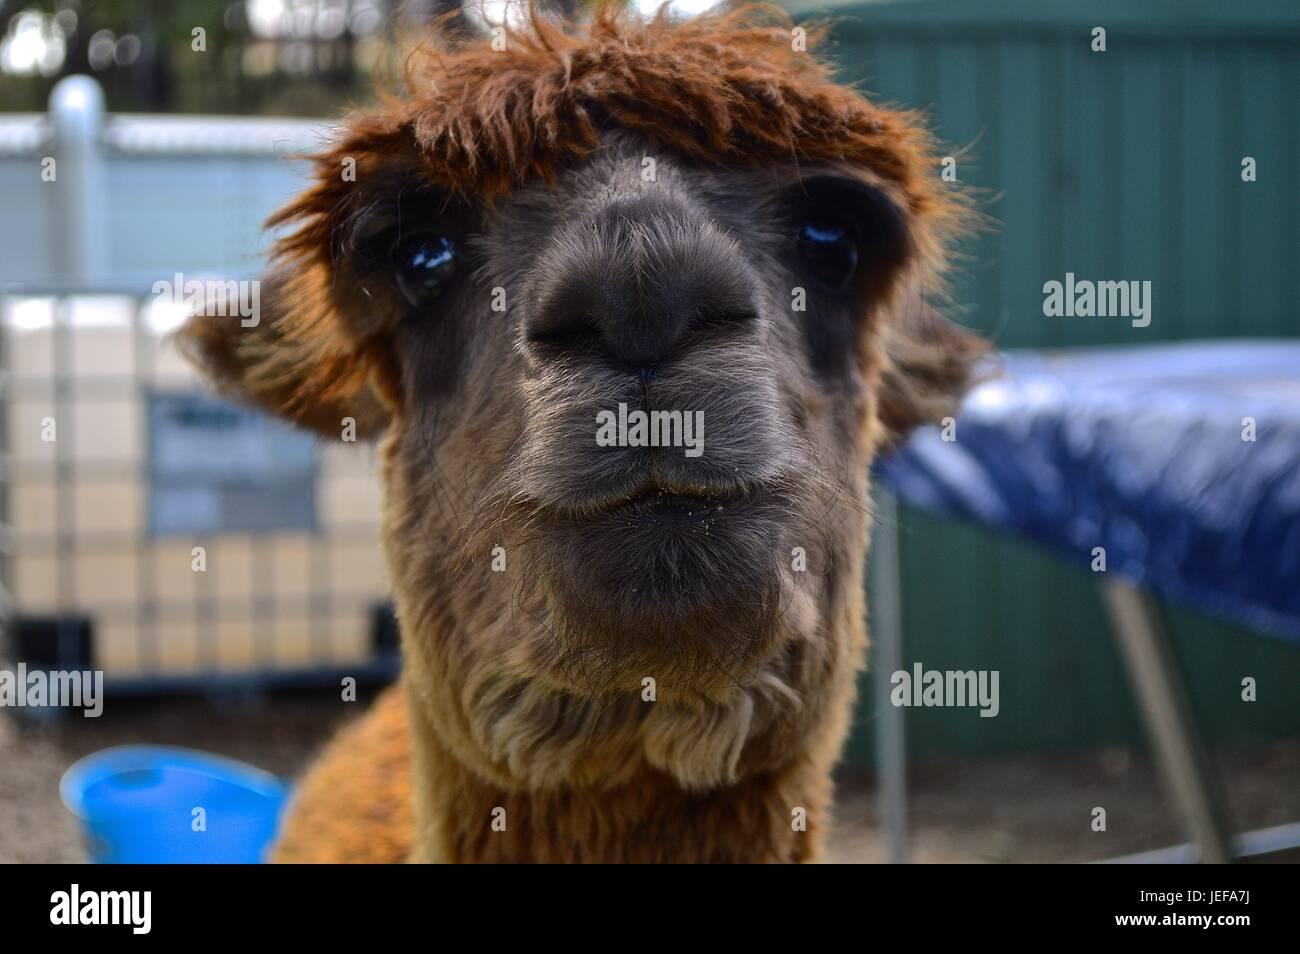 Brown suri alpaca face Stock Photo